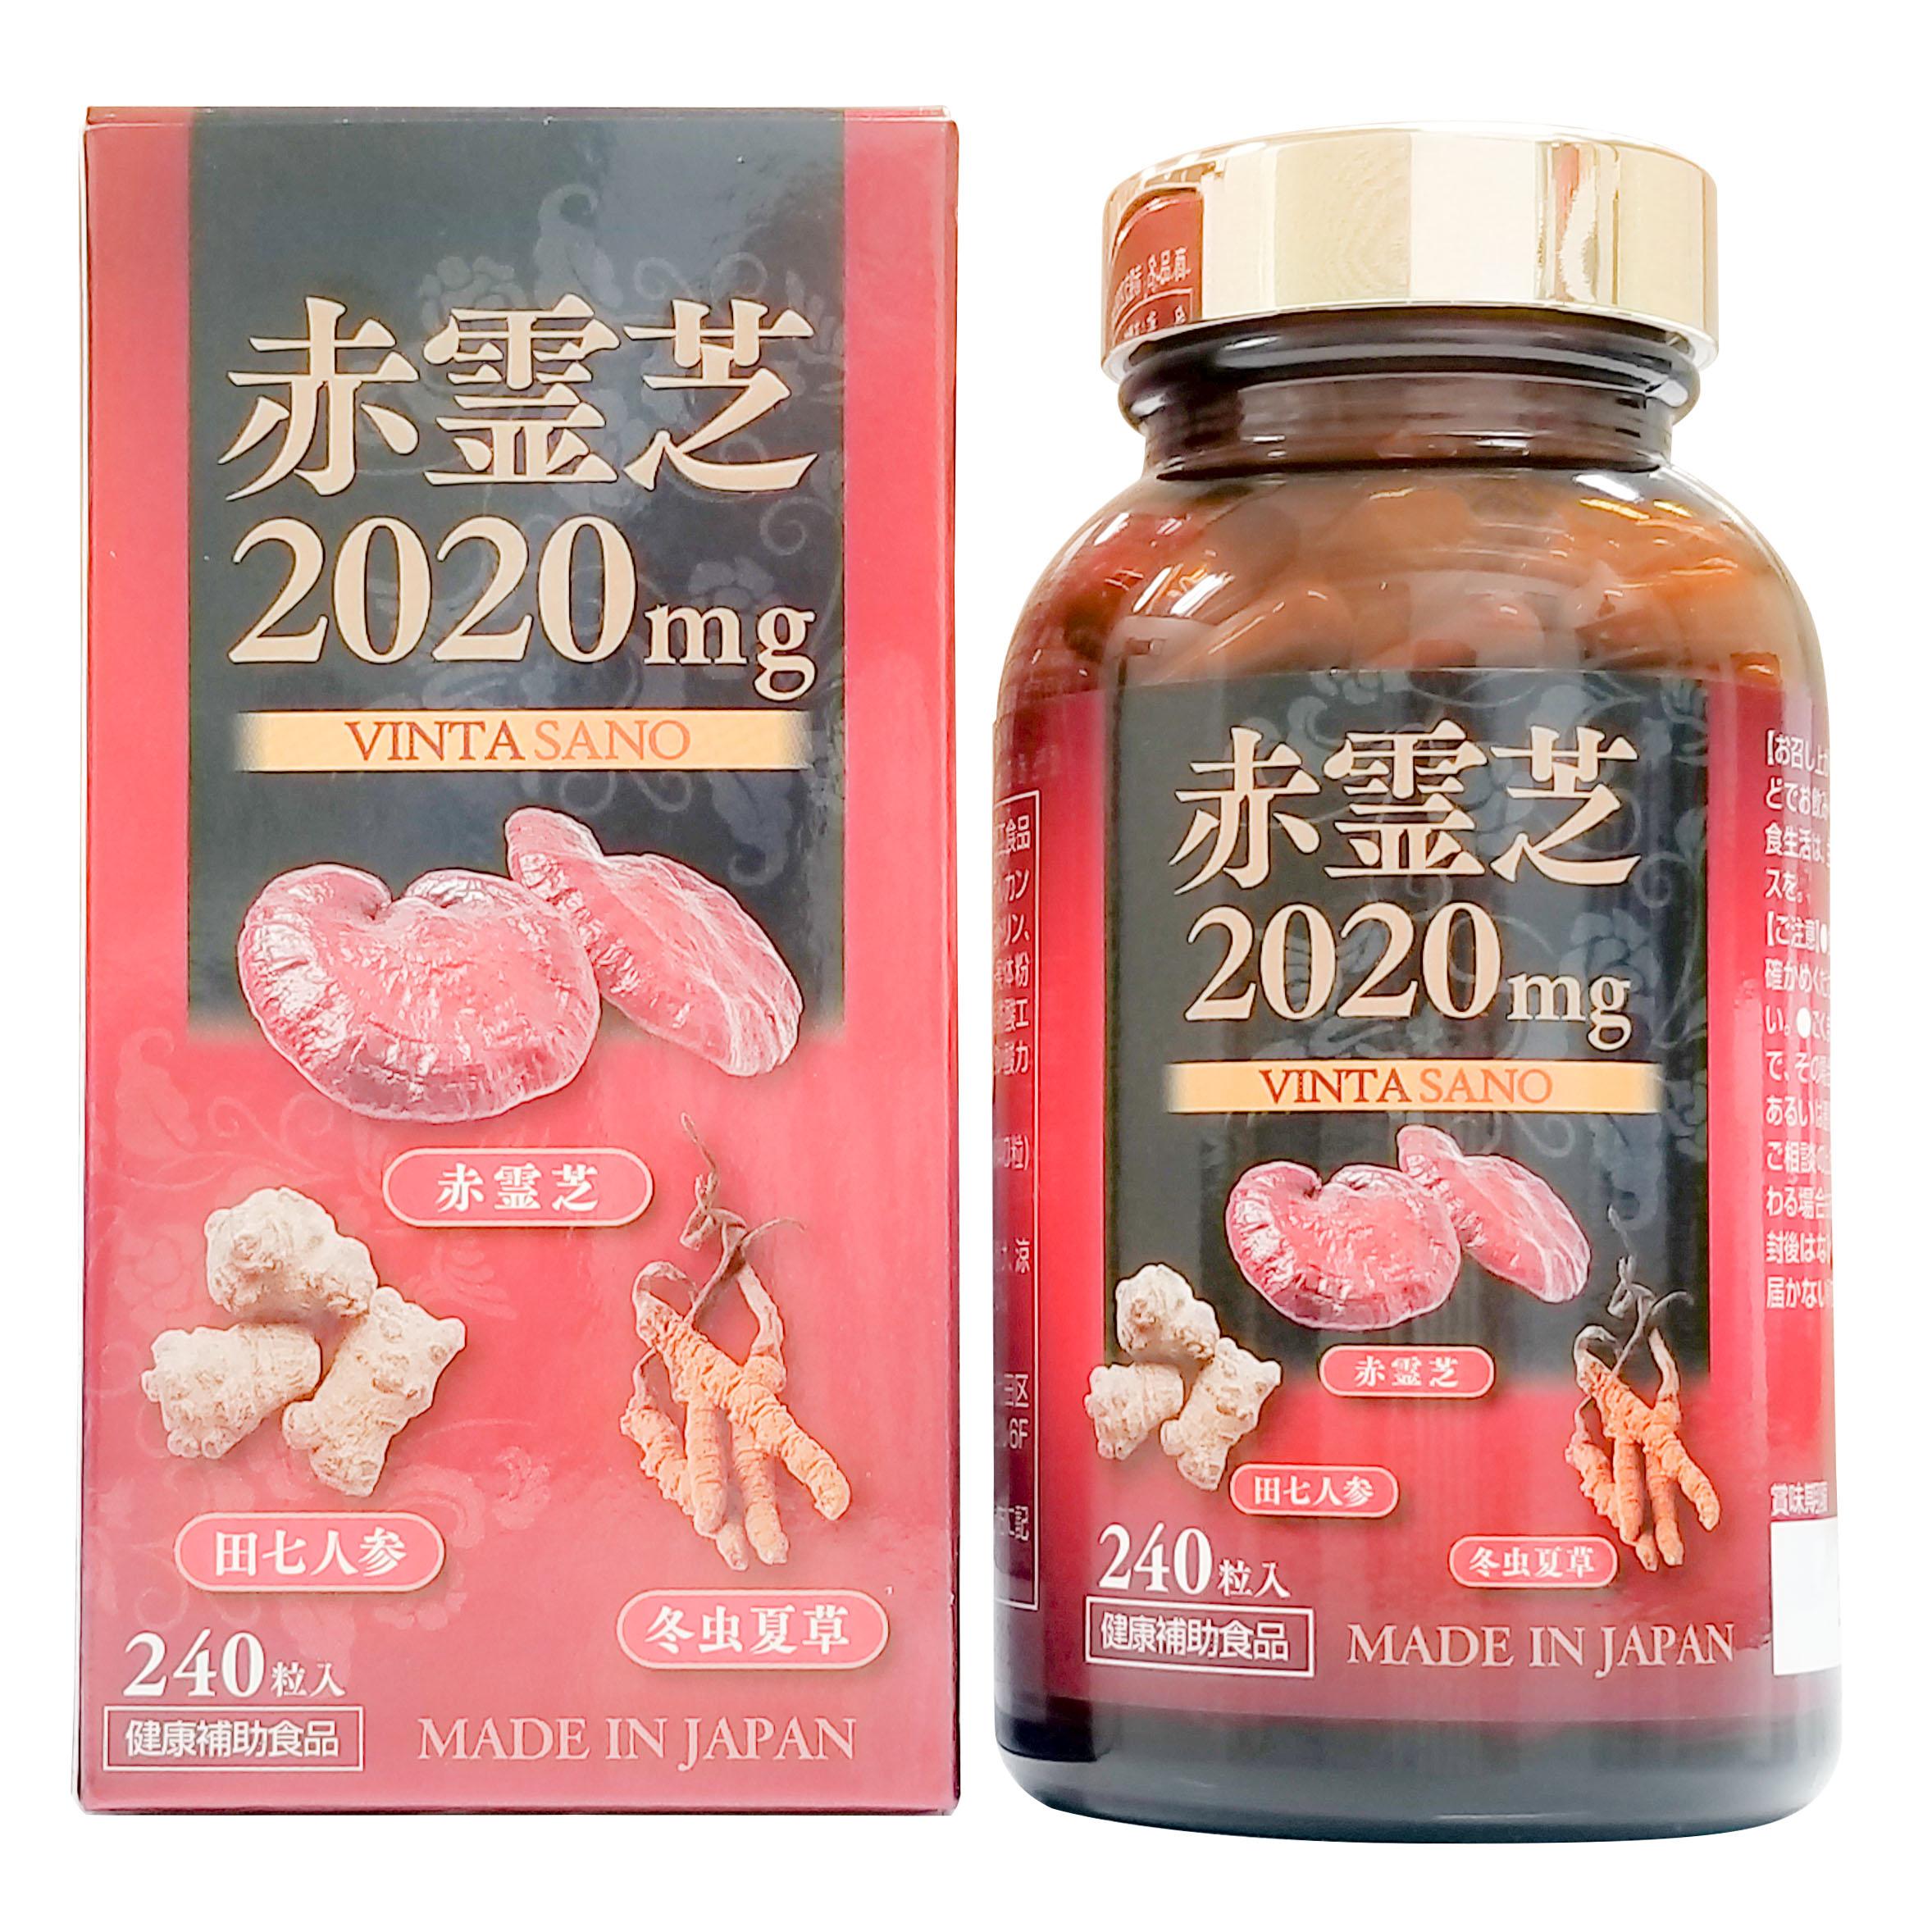 Premium Akareshi 2020|Vinta Sano